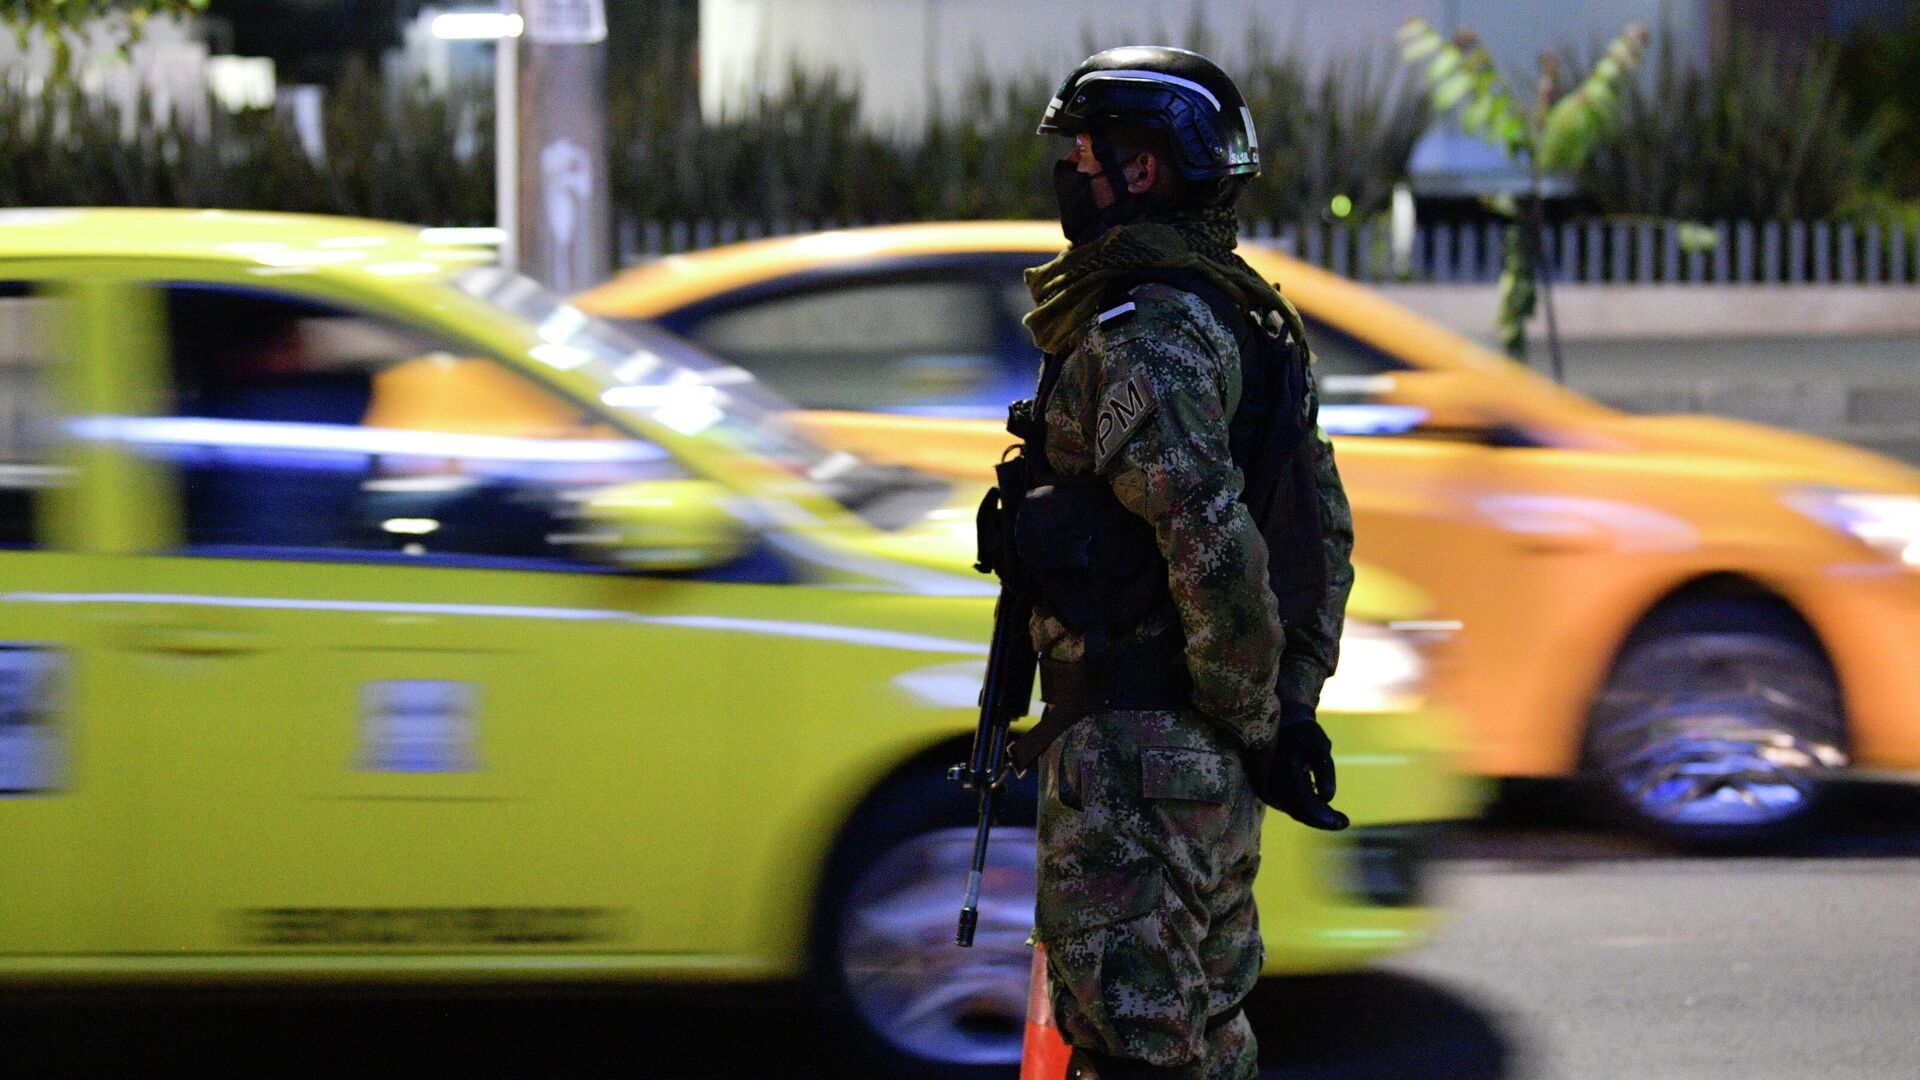 Policía militar en Bogotá, Colombia - Sputnik Mundo, 1920, 21.09.2021